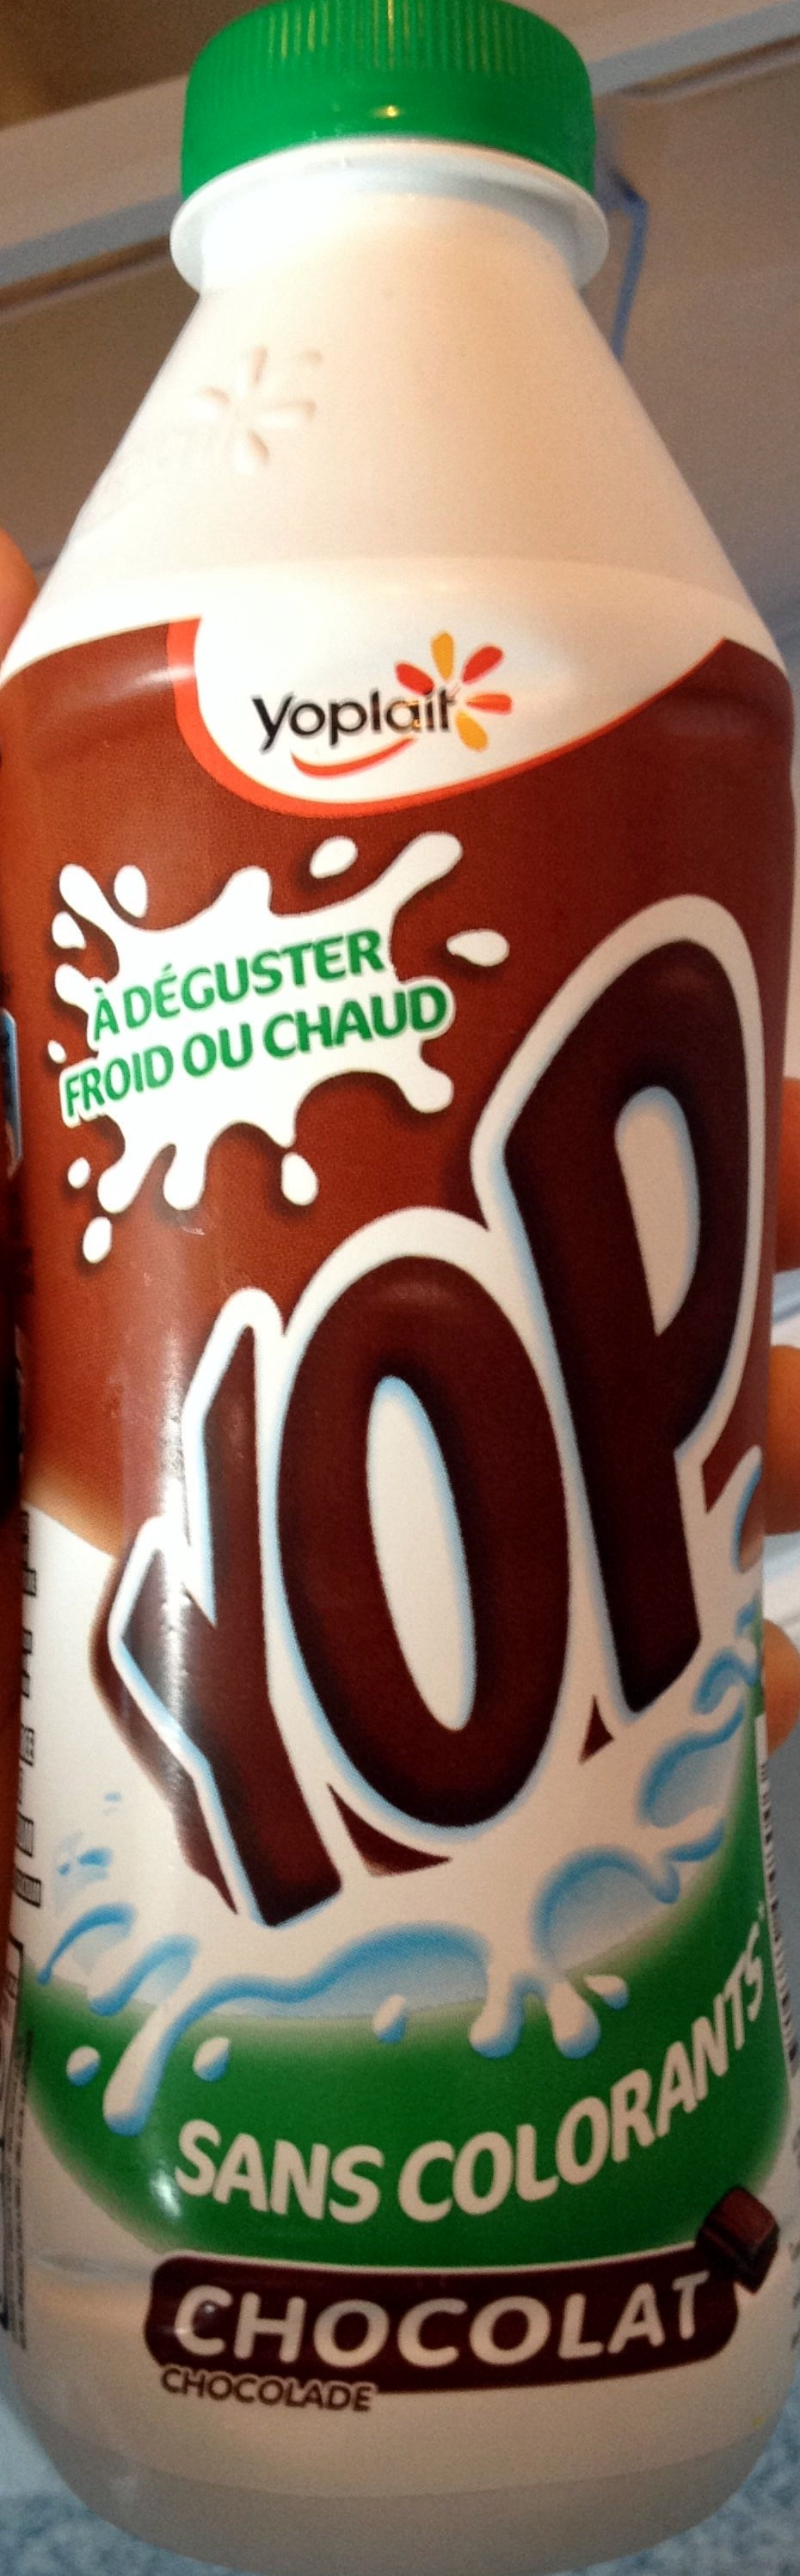 Yop, Chocolat - Produit - fr